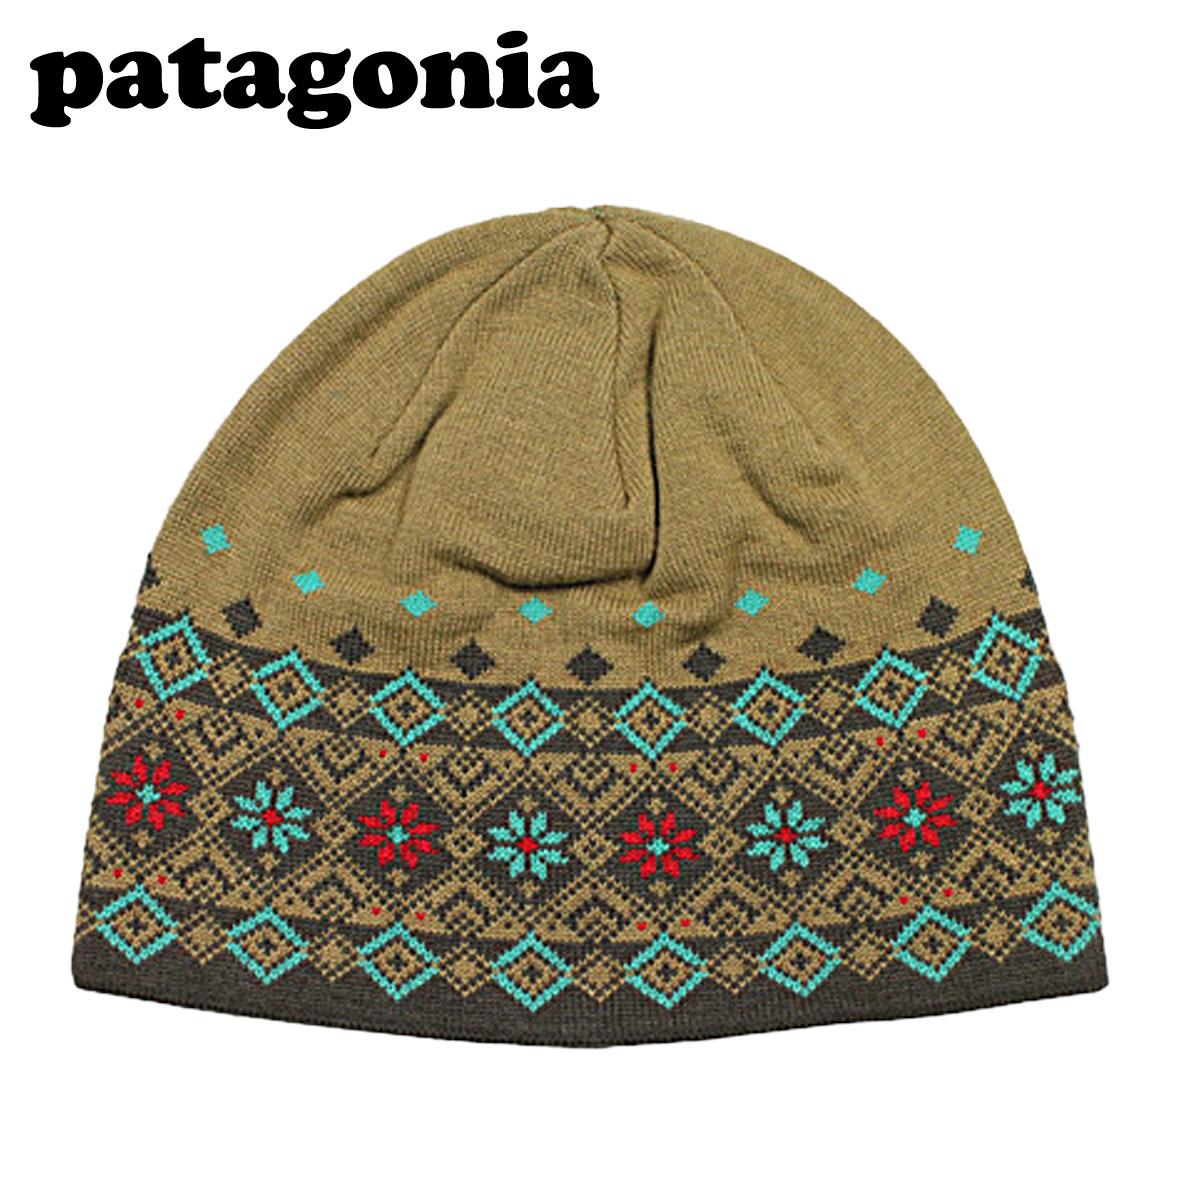 Sugar Online Shop  Patagonia patagonia knitted Cap 28839 Patagonia Beanie  Hat nylon men s women s  111f8339dd